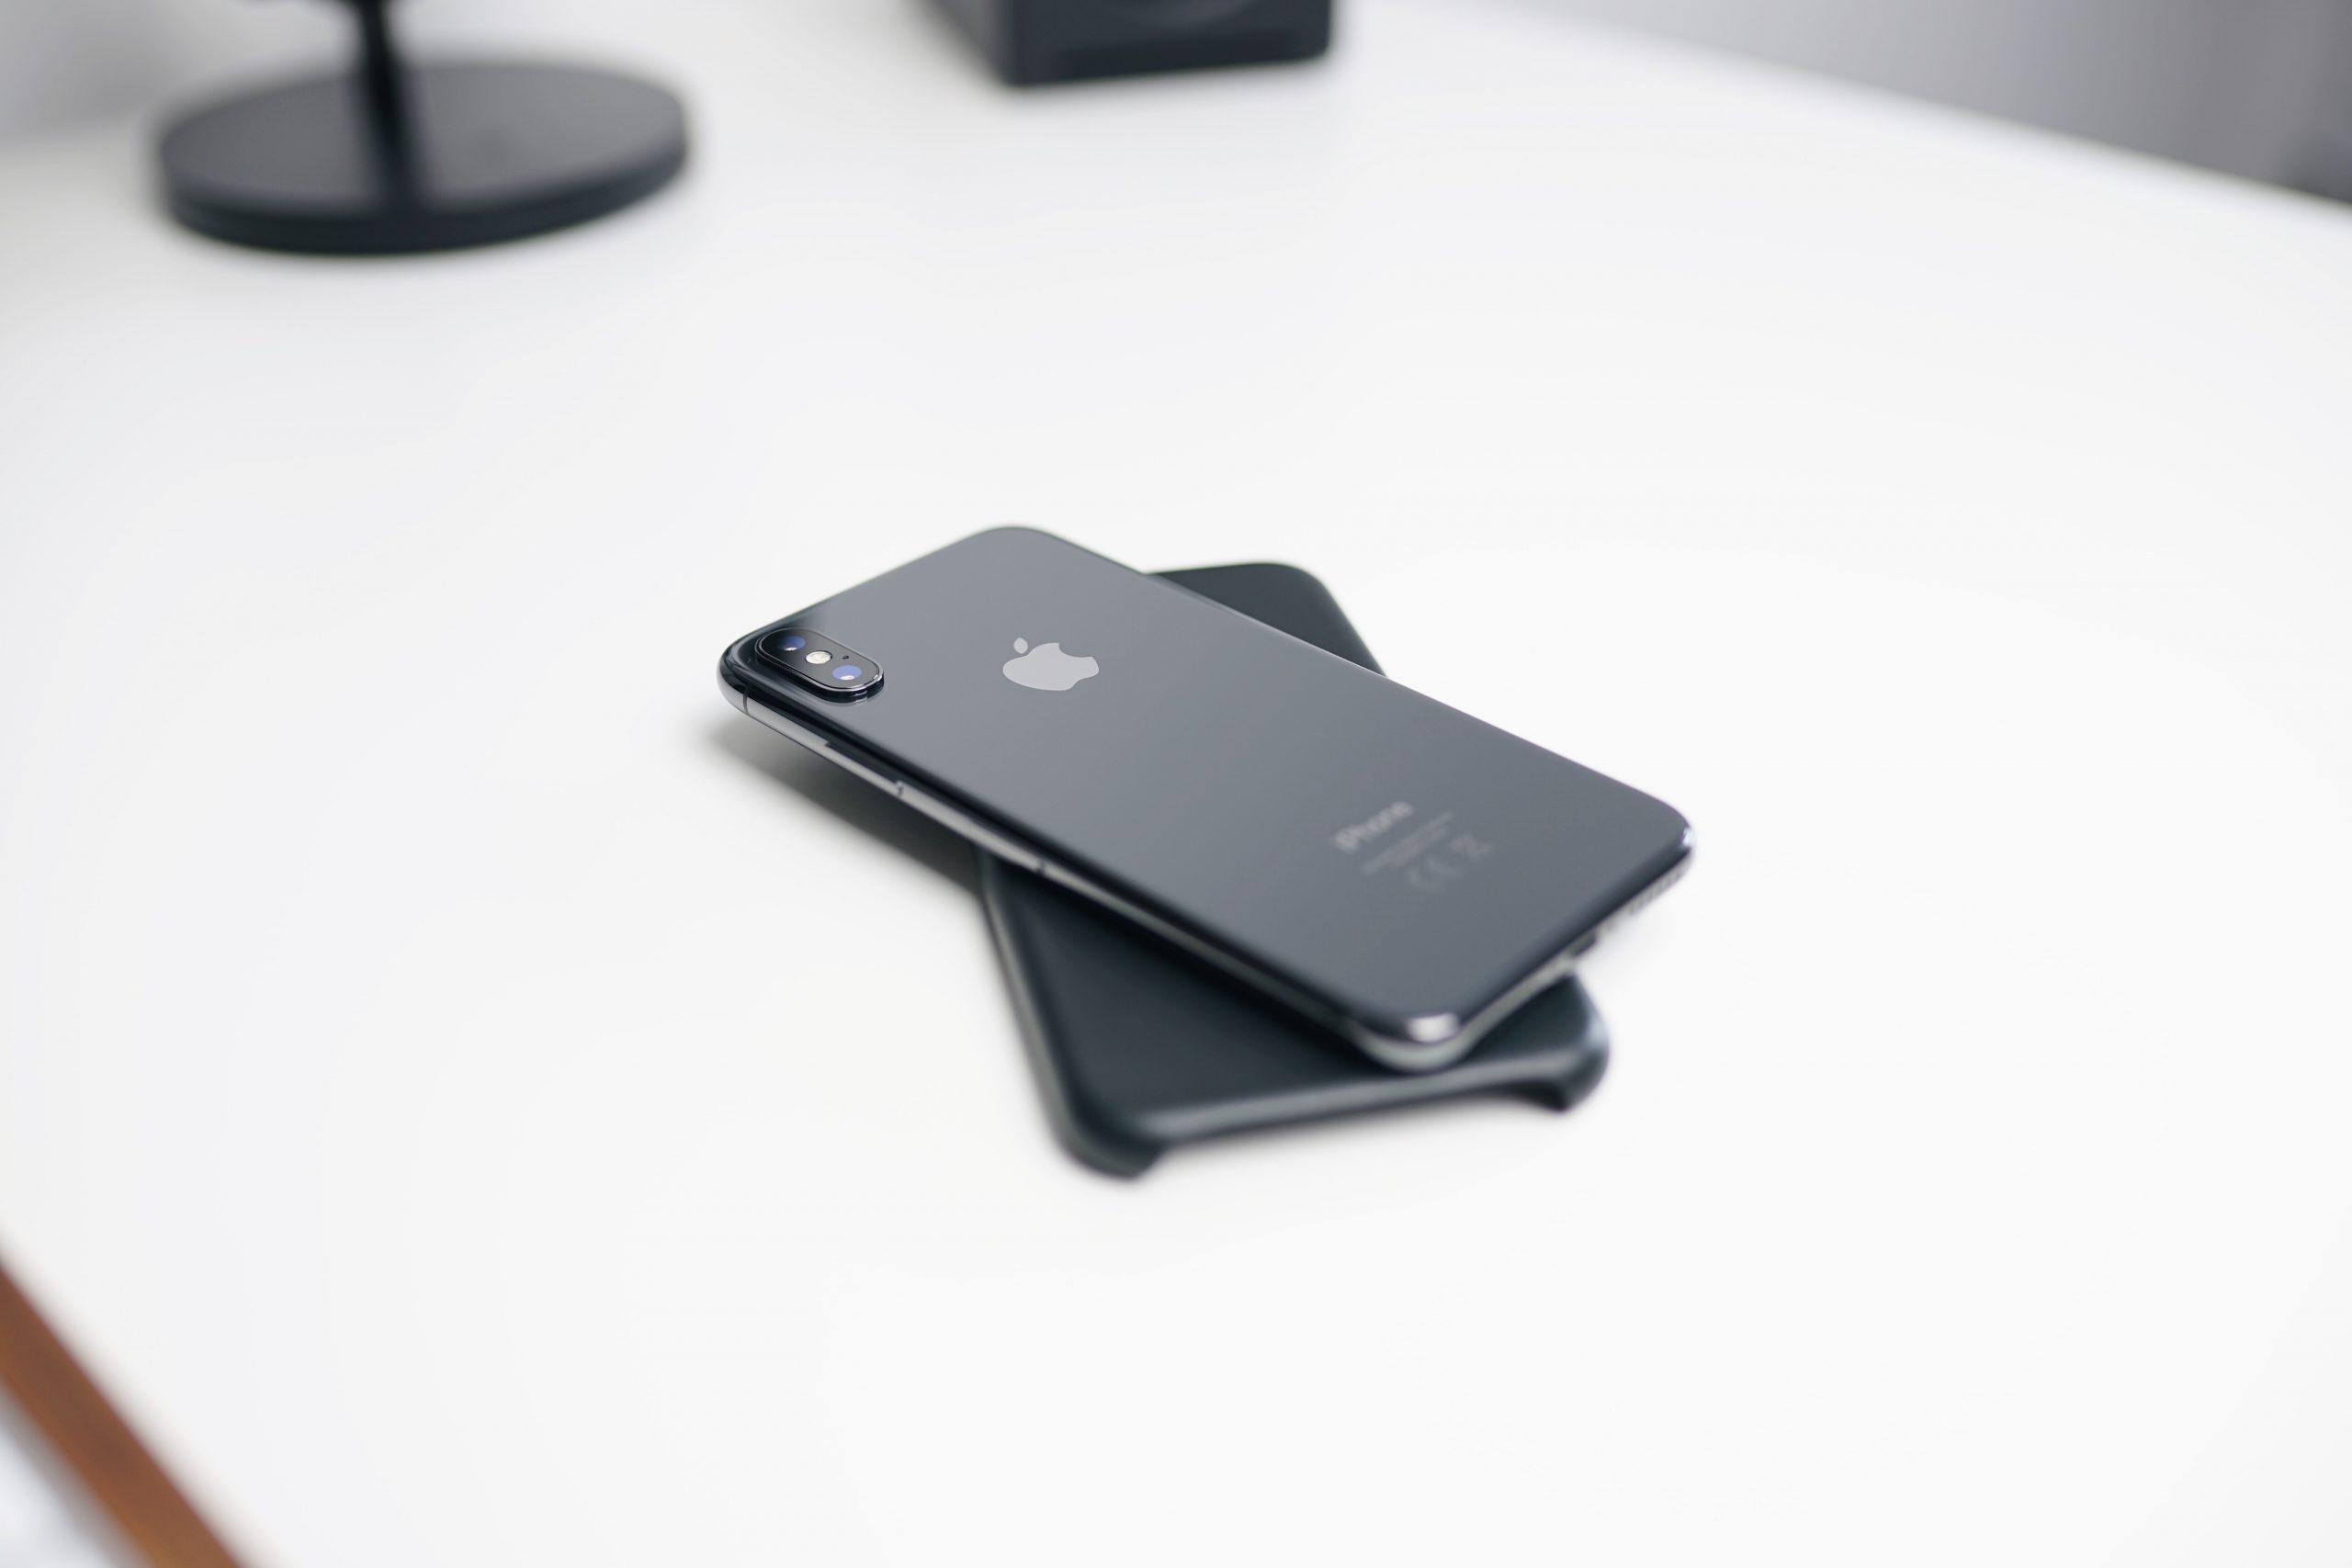 Iphone na bielom stole